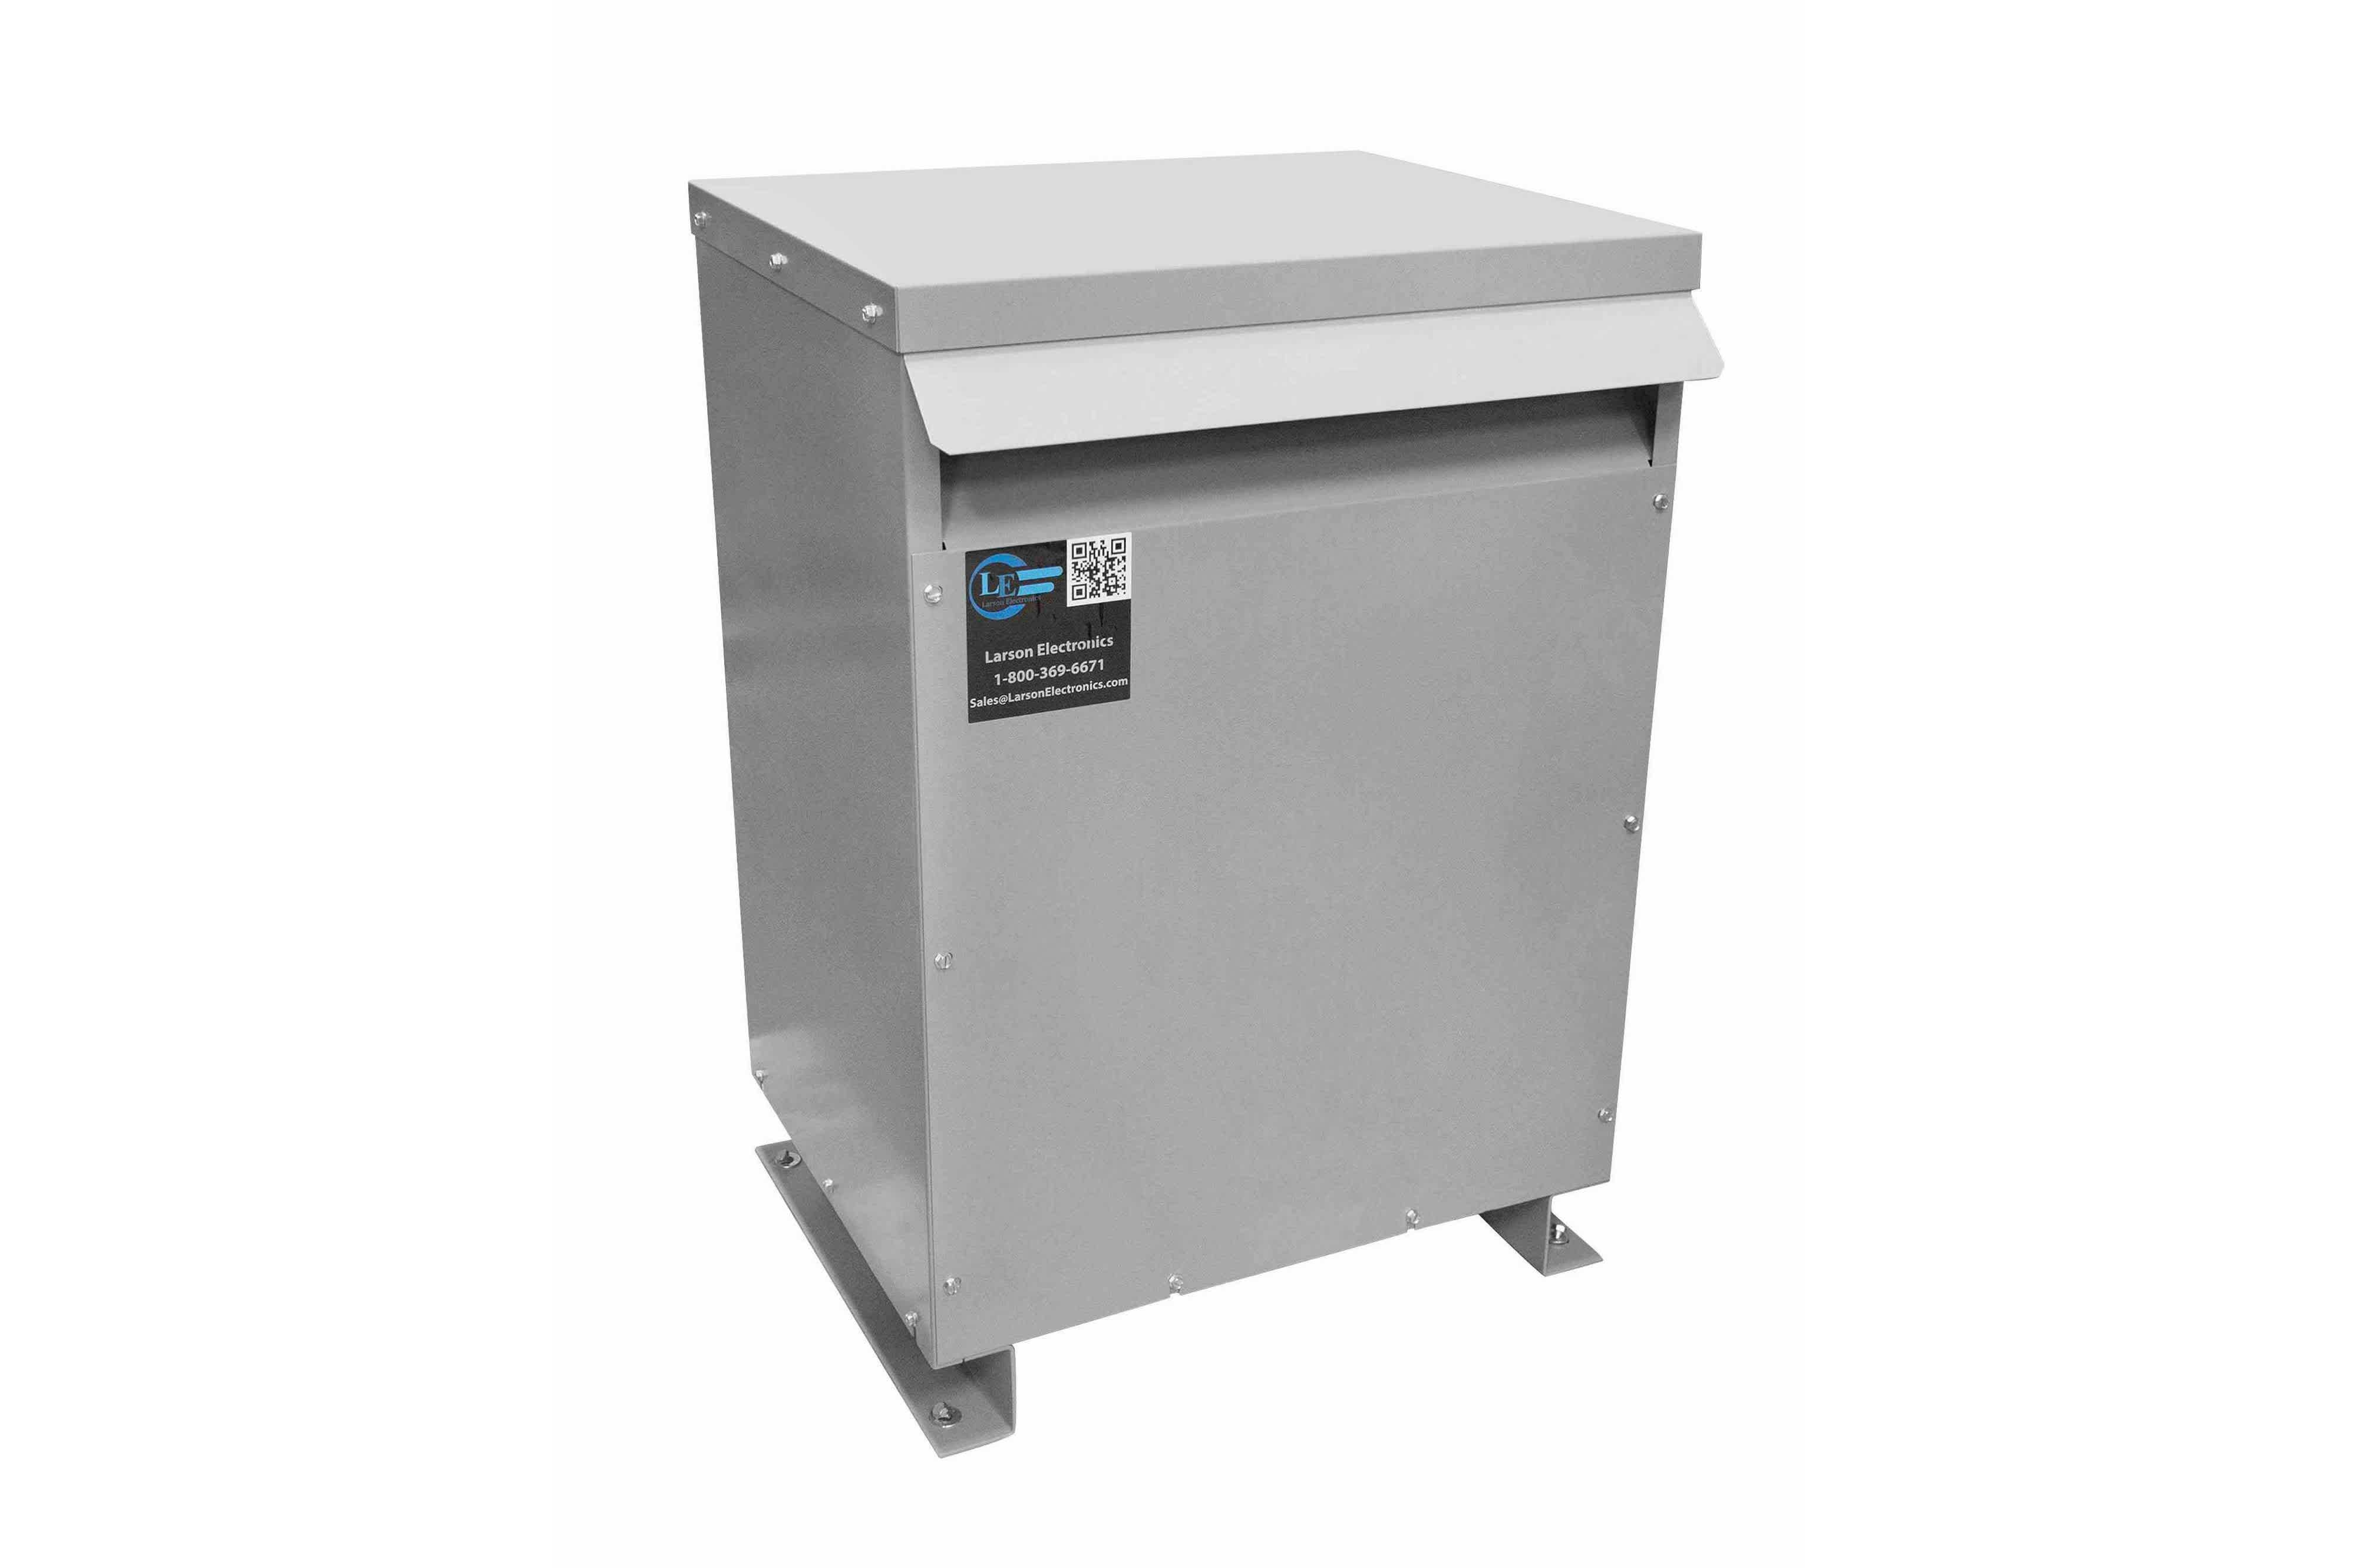 237.5 kVA 3PH Isolation Transformer, 208V Wye Primary, 208V Delta Secondary, N3R, Ventilated, 60 Hz